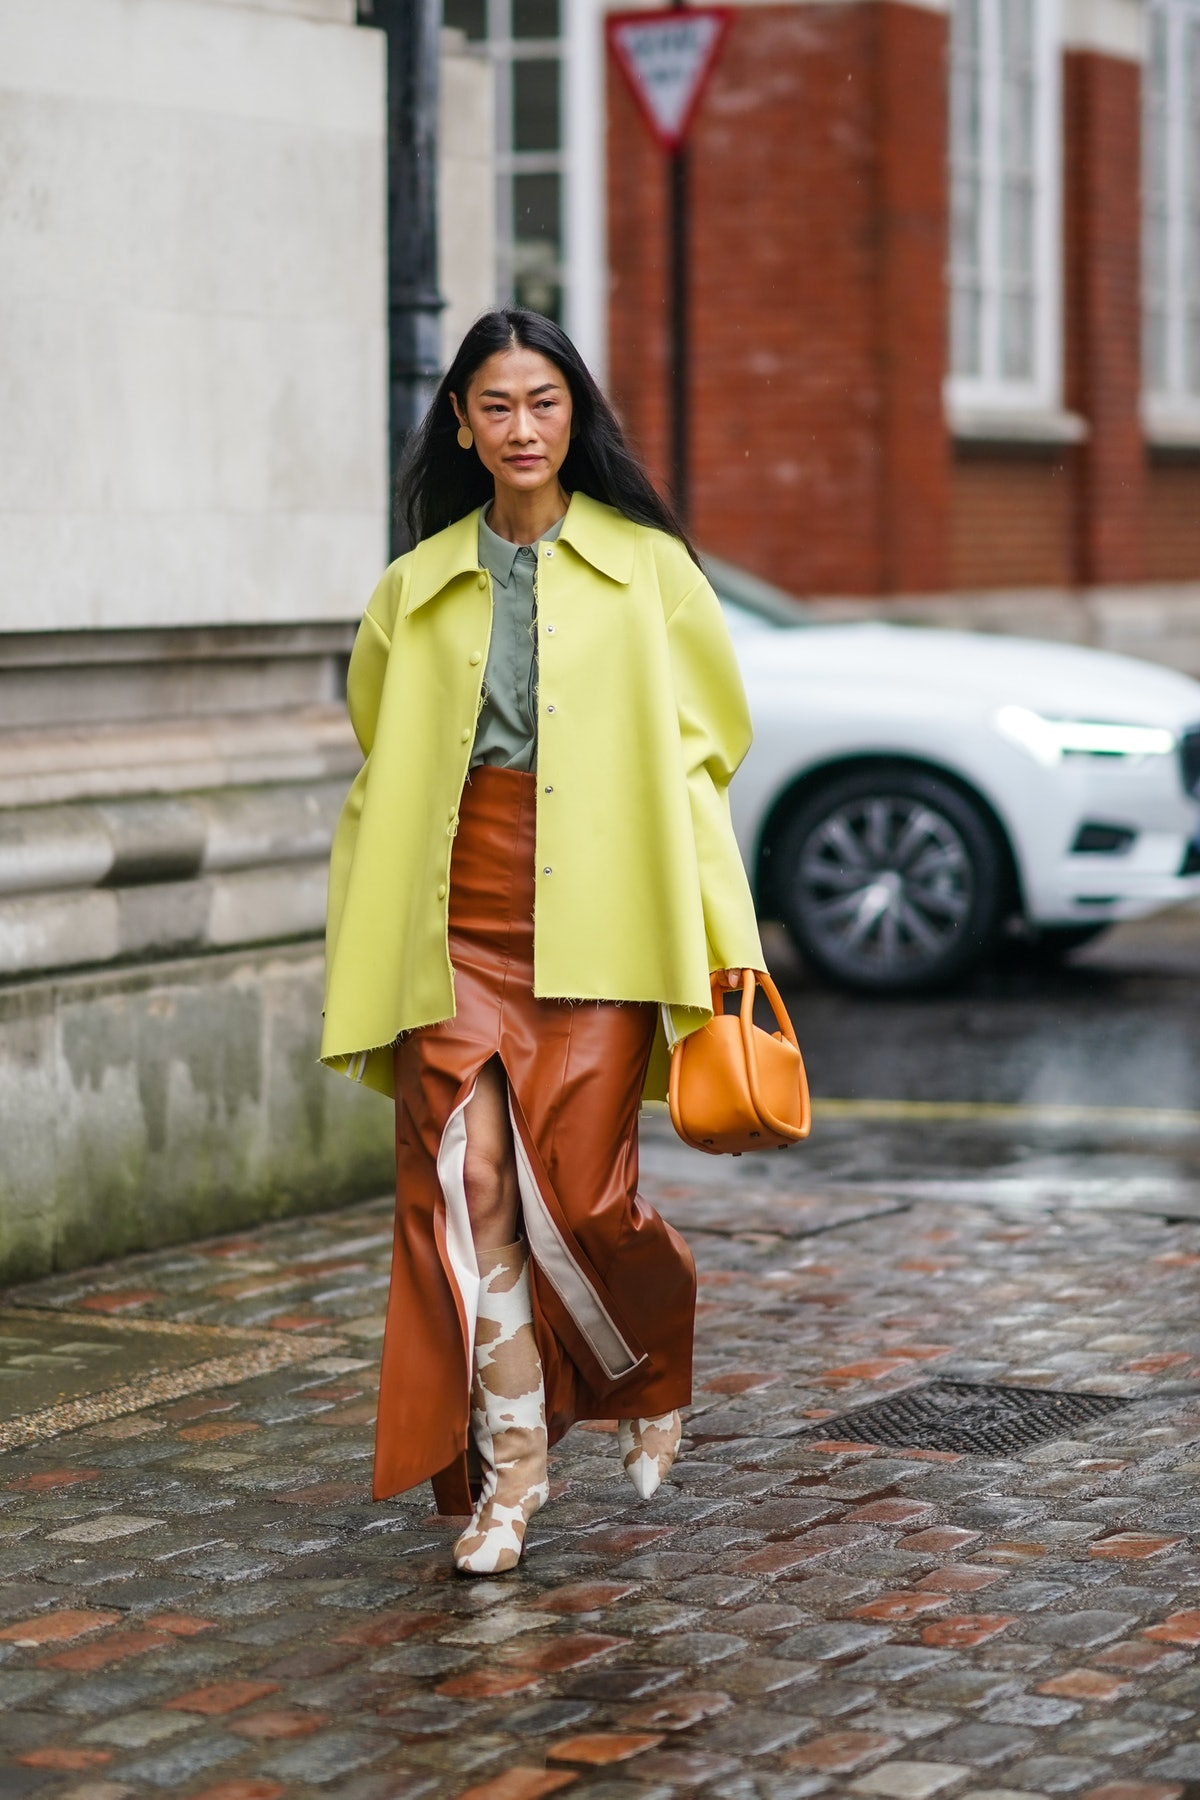 LONDON, ENGLAND - FEBRUARY 15: Fashion blogger Pornwika wears a yellow oversized jacket, an orange b...